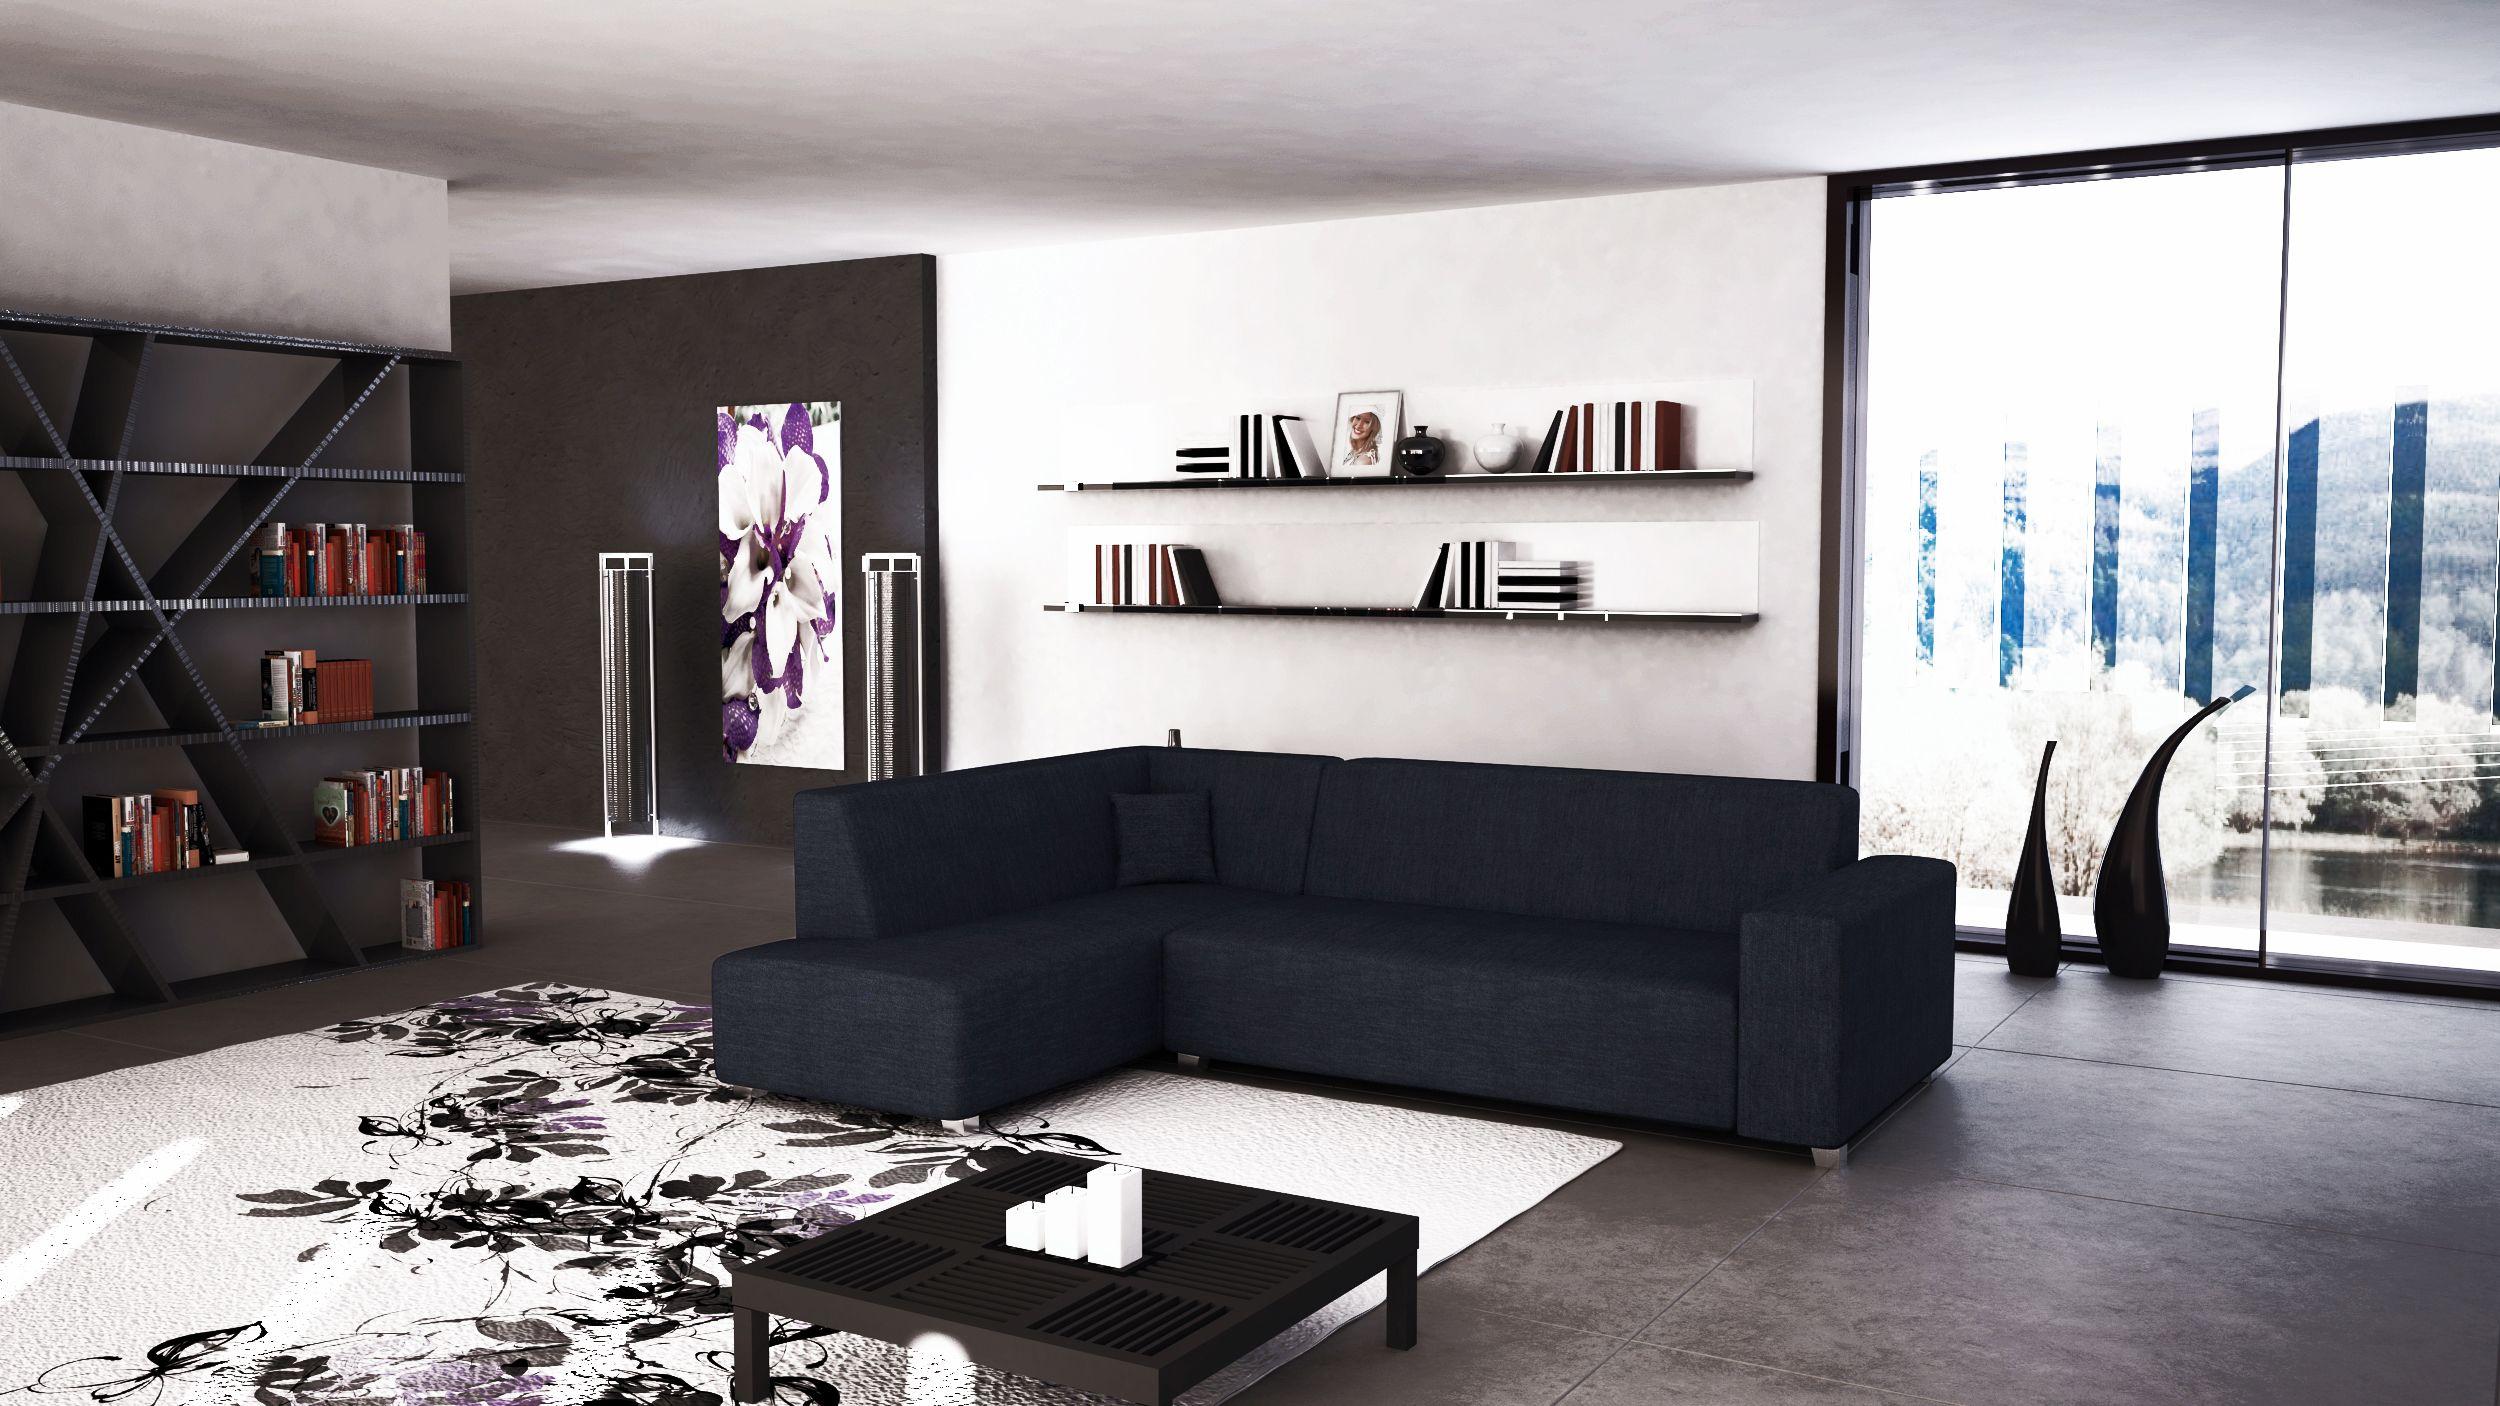 Sof cama tina de l nea minimalista tapizado en tela de for Sofas cama de 90 de ancho